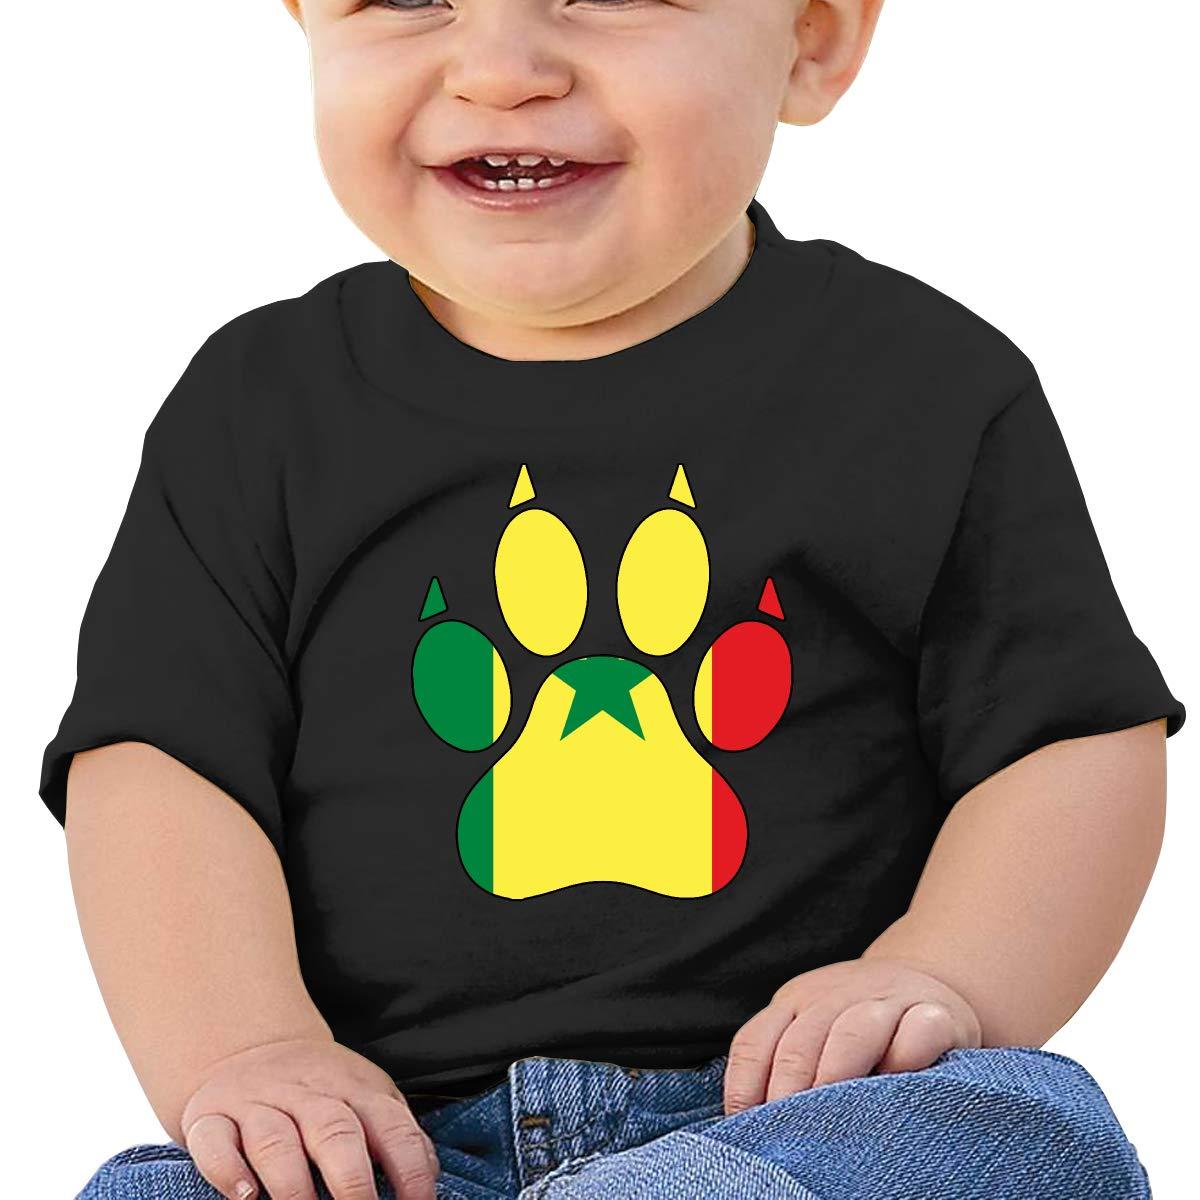 Senegal Flag Dog Paw Newborn Baby Short Sleeve Crewneck Tee Shirt 6-18 Month Tops